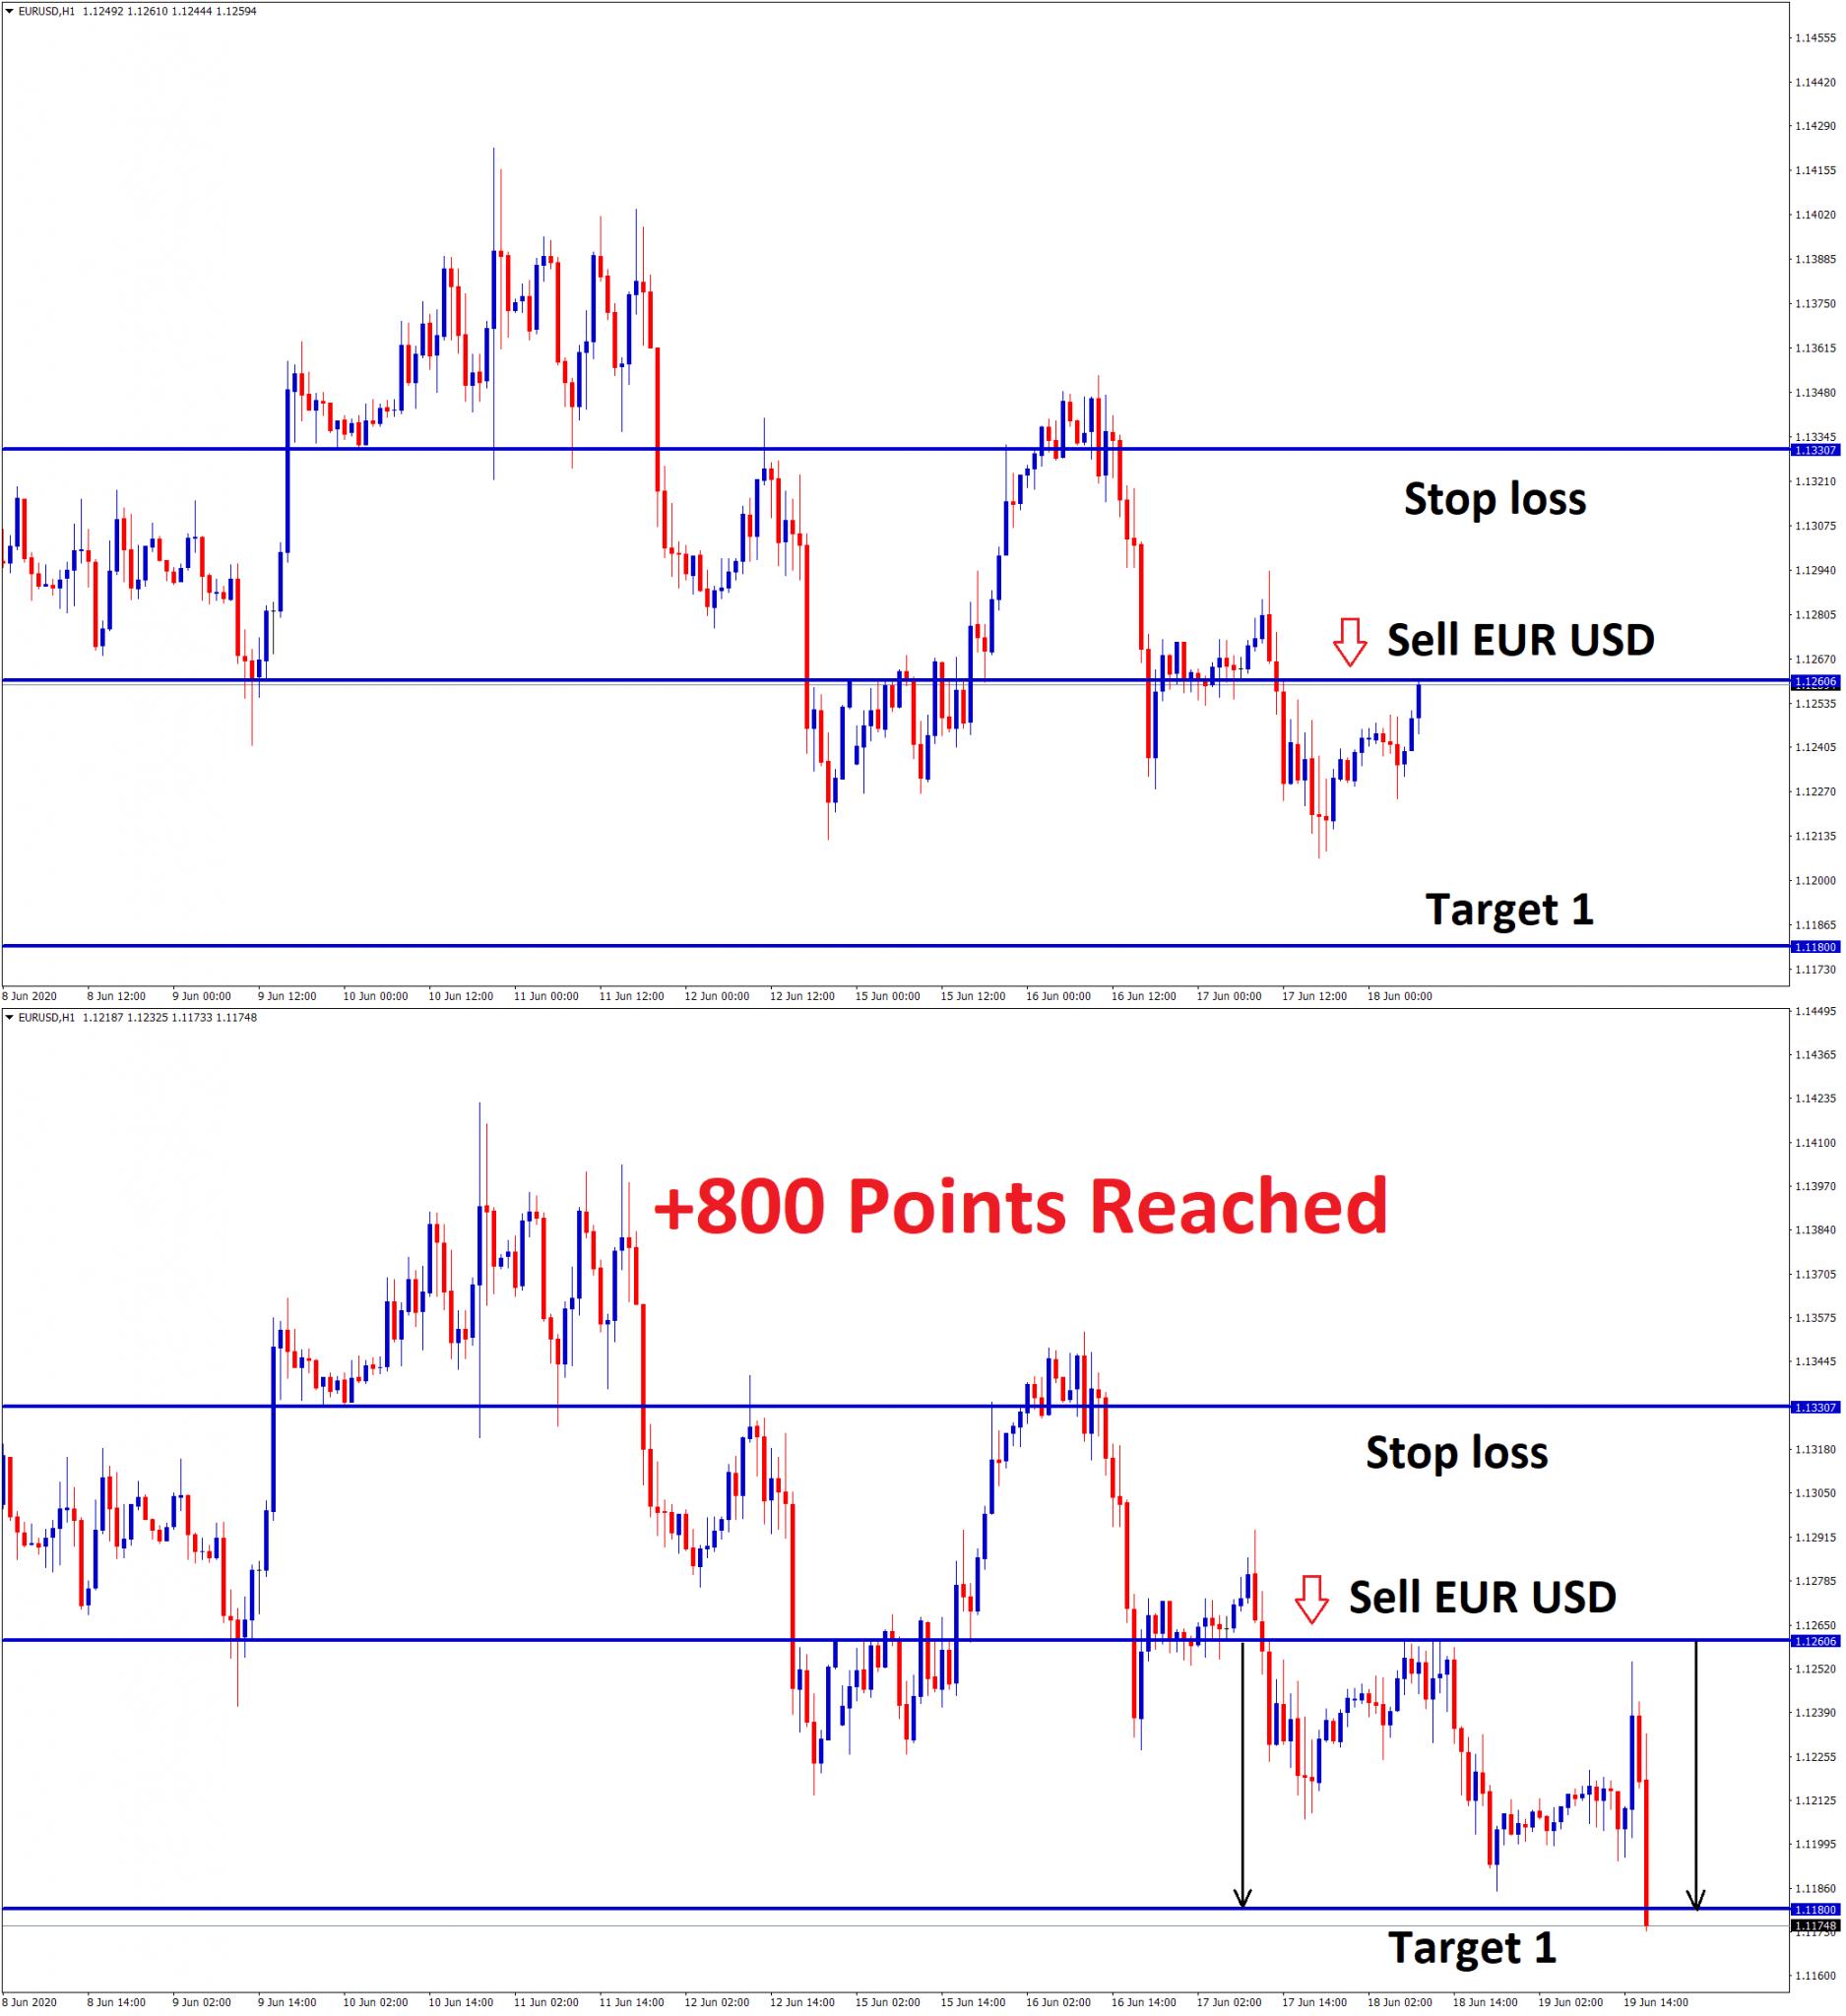 eurusd 800 points recahed